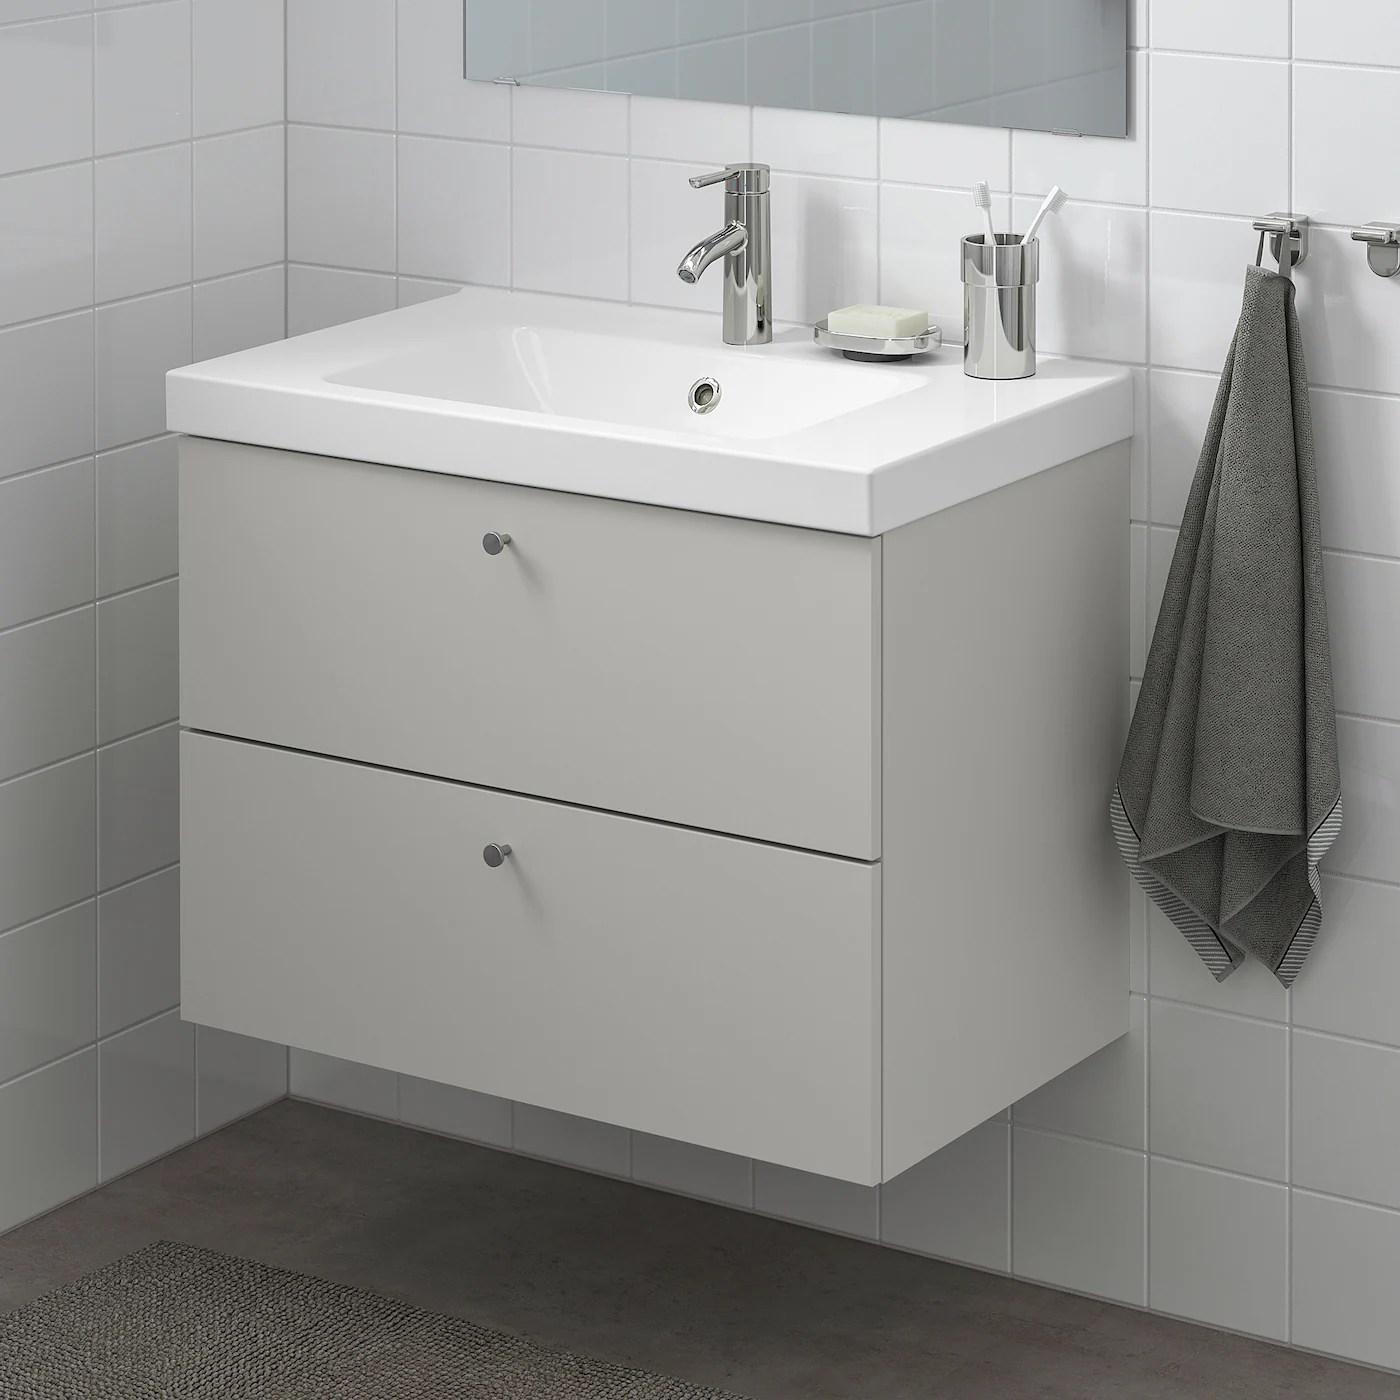 godmorgon odensvik bathroom vanity gillburen light gray dalskar faucet 32 5 8x19 1 4x25 1 4 83x49x64 cm